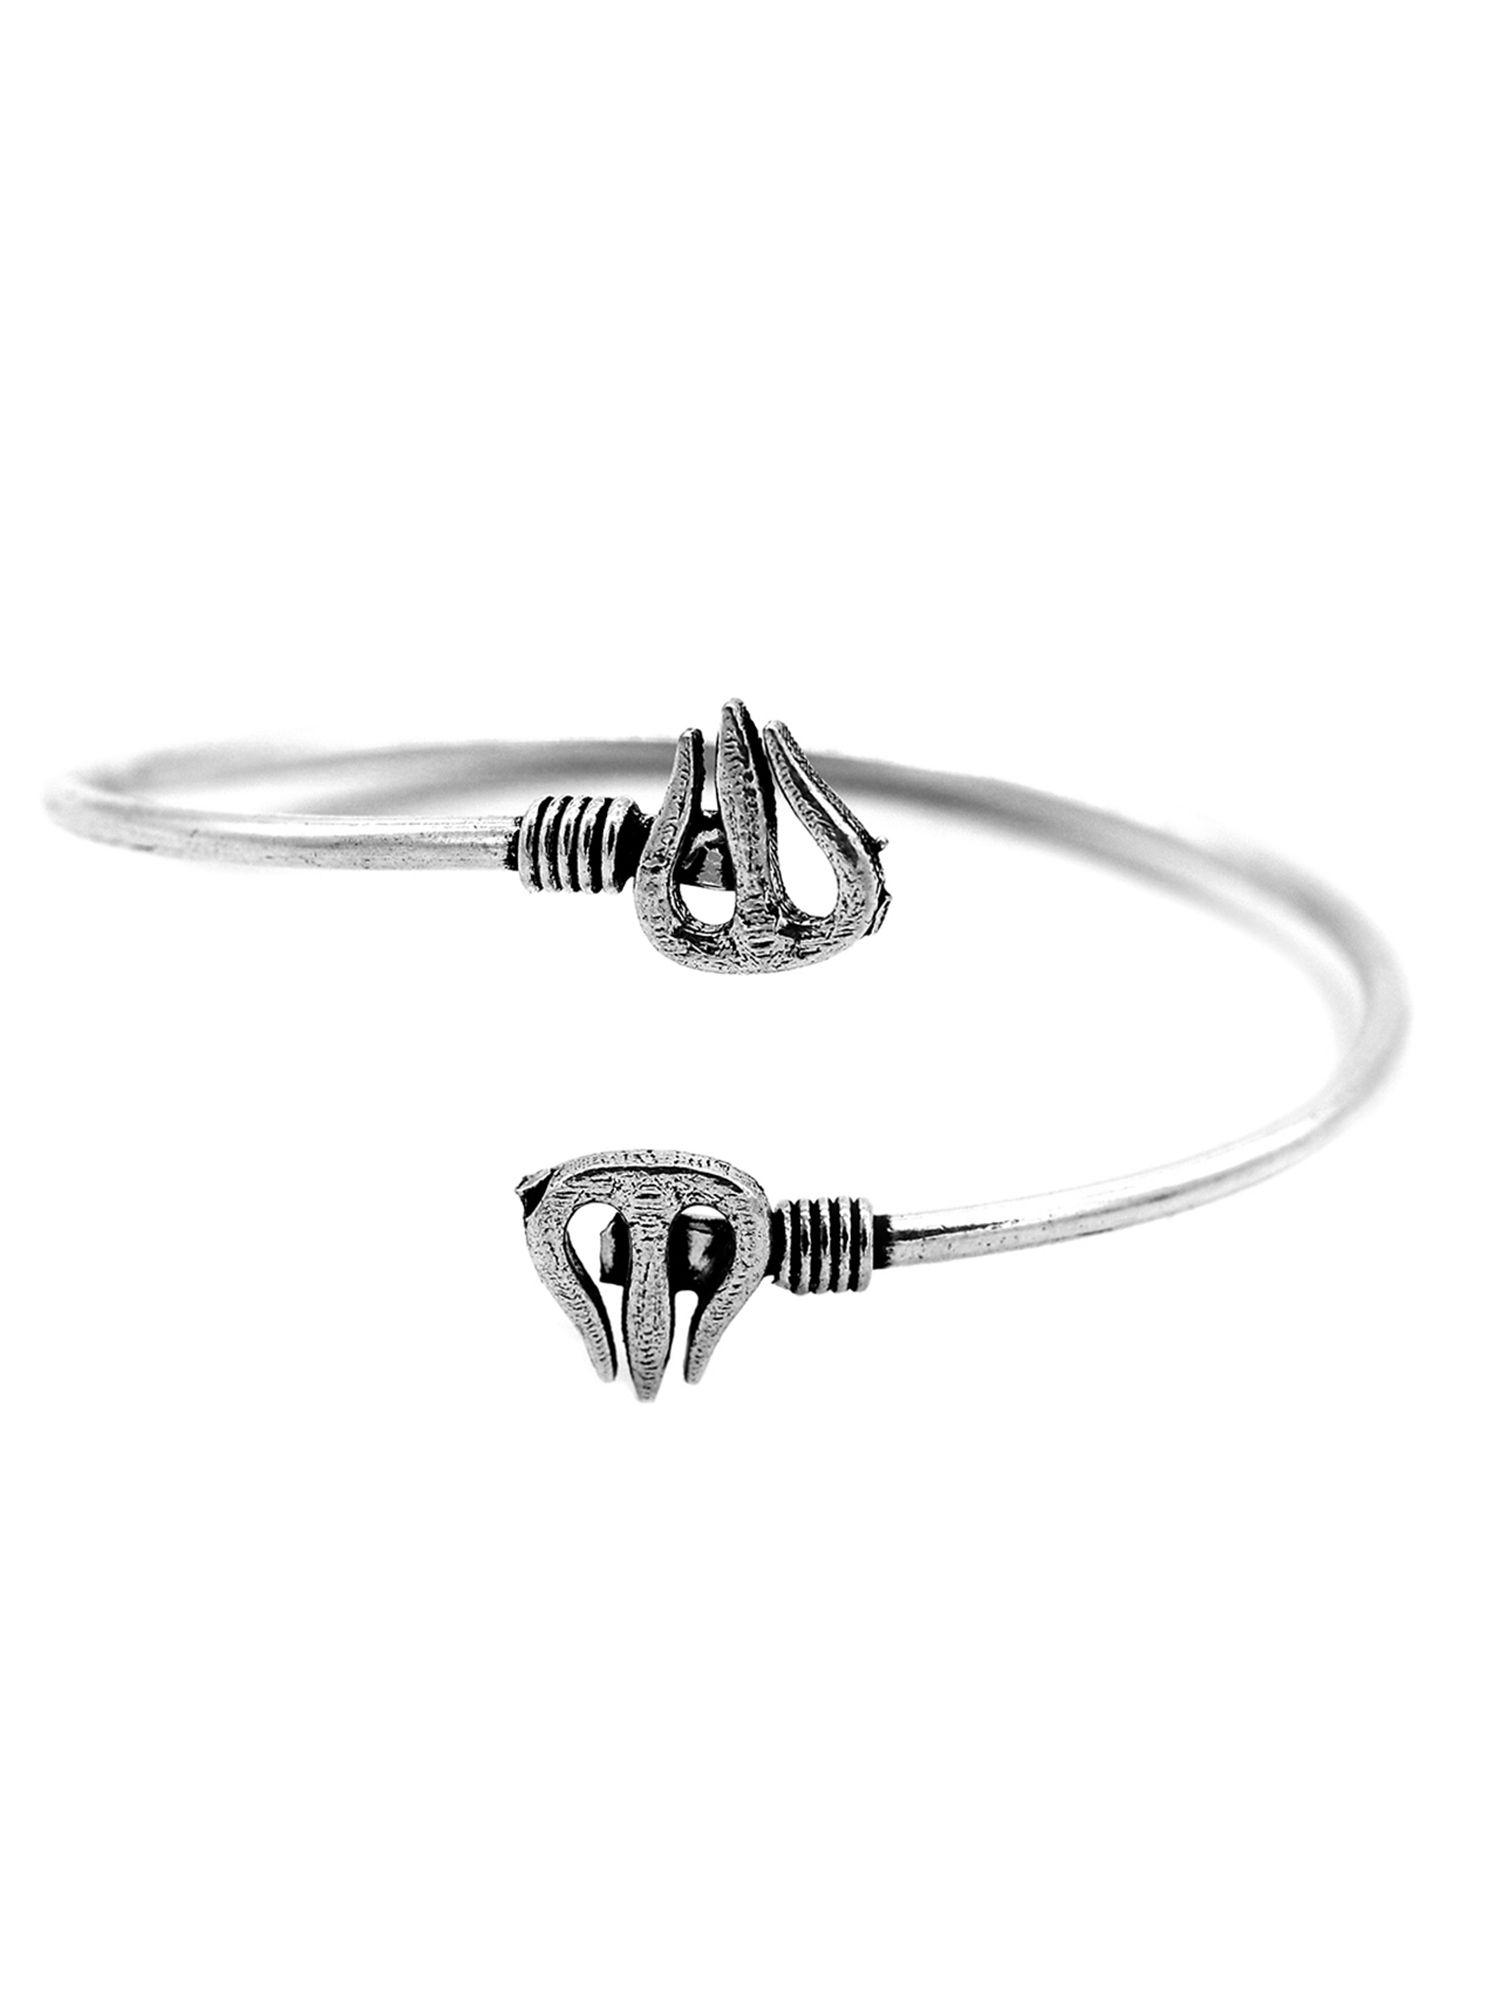 Black Bella Toe Ring in Oxidized German Silver